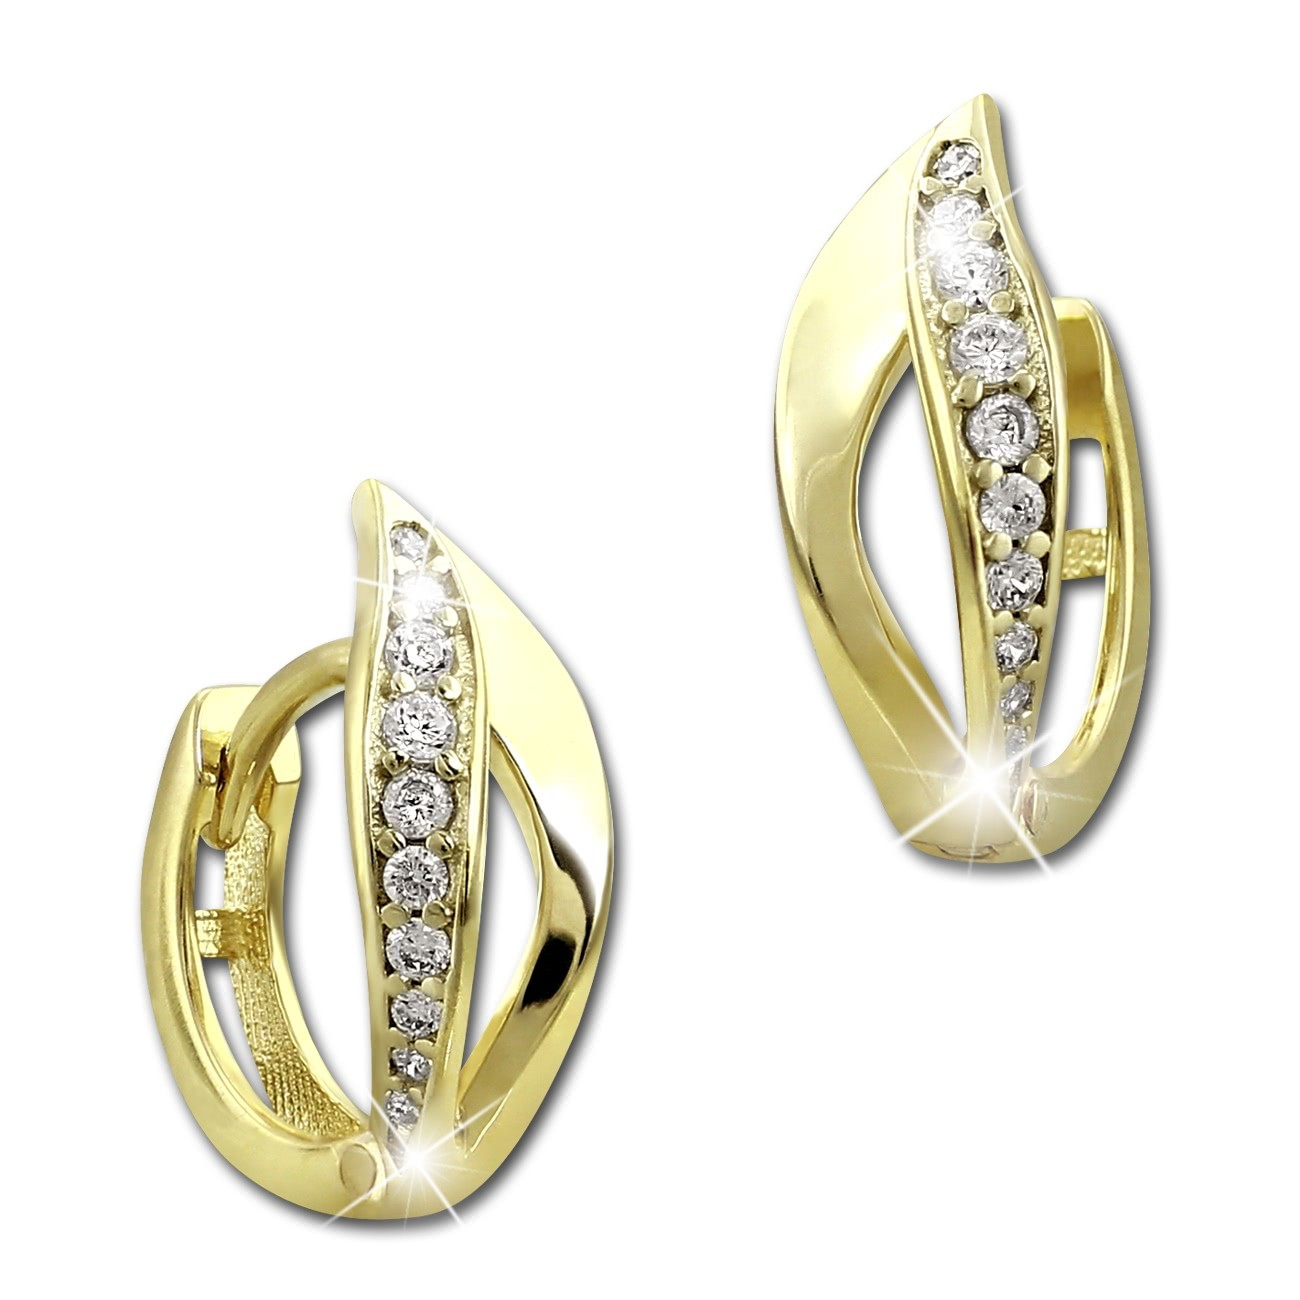 SilberDream Creole Blatt Zirkonia weiß Ohrring 333 Gold Echtschmuck GDO525WY